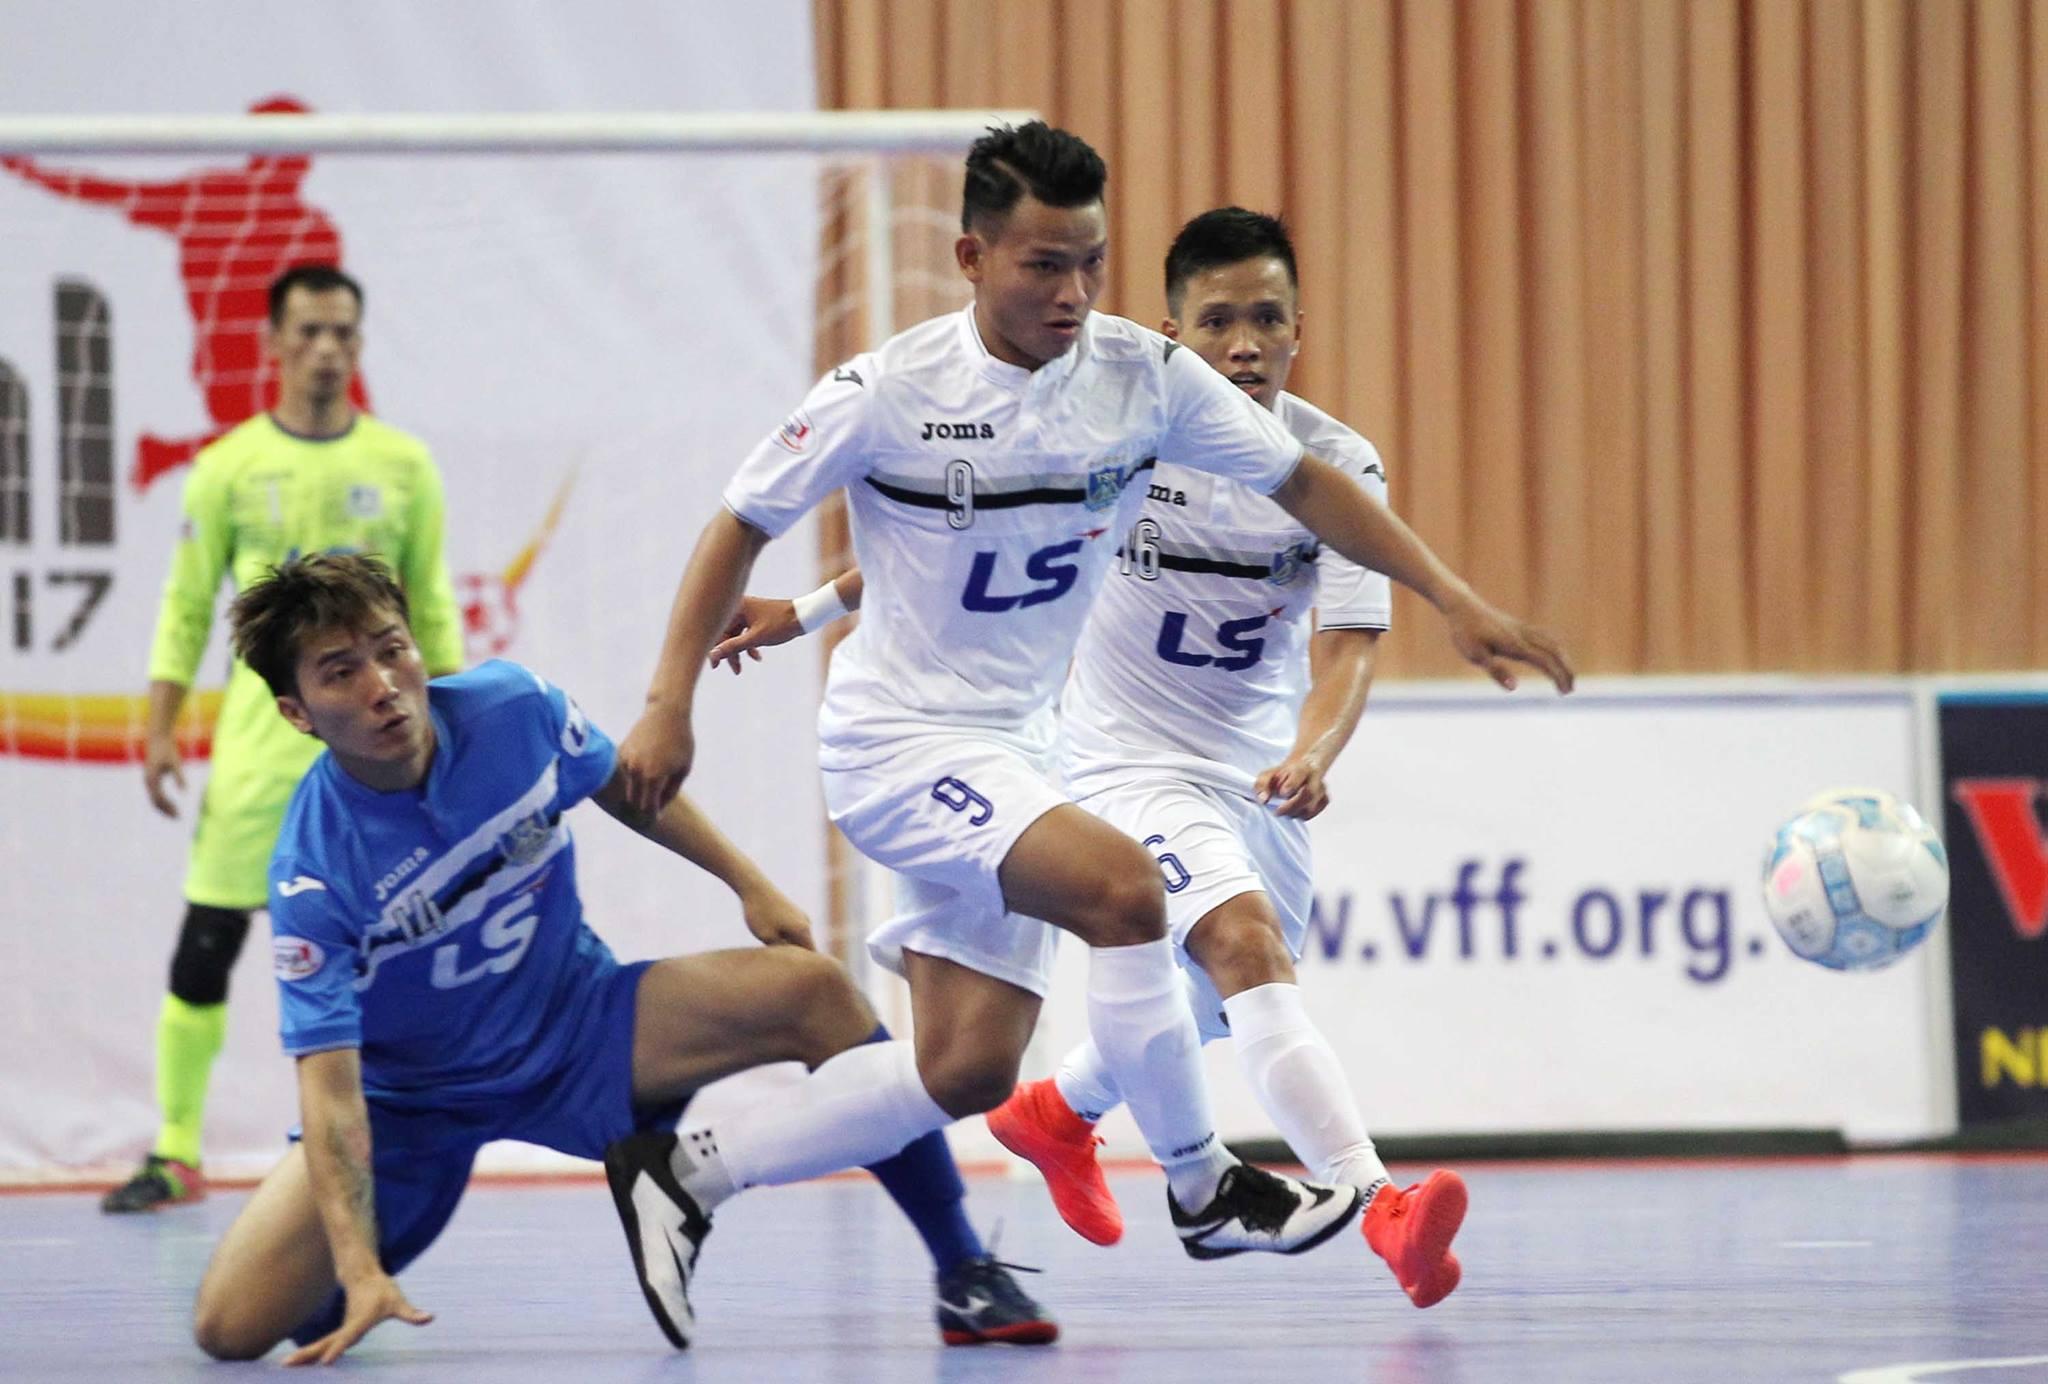 2 tân binh tham dự Giải Futsal VĐQG HDBank 2019